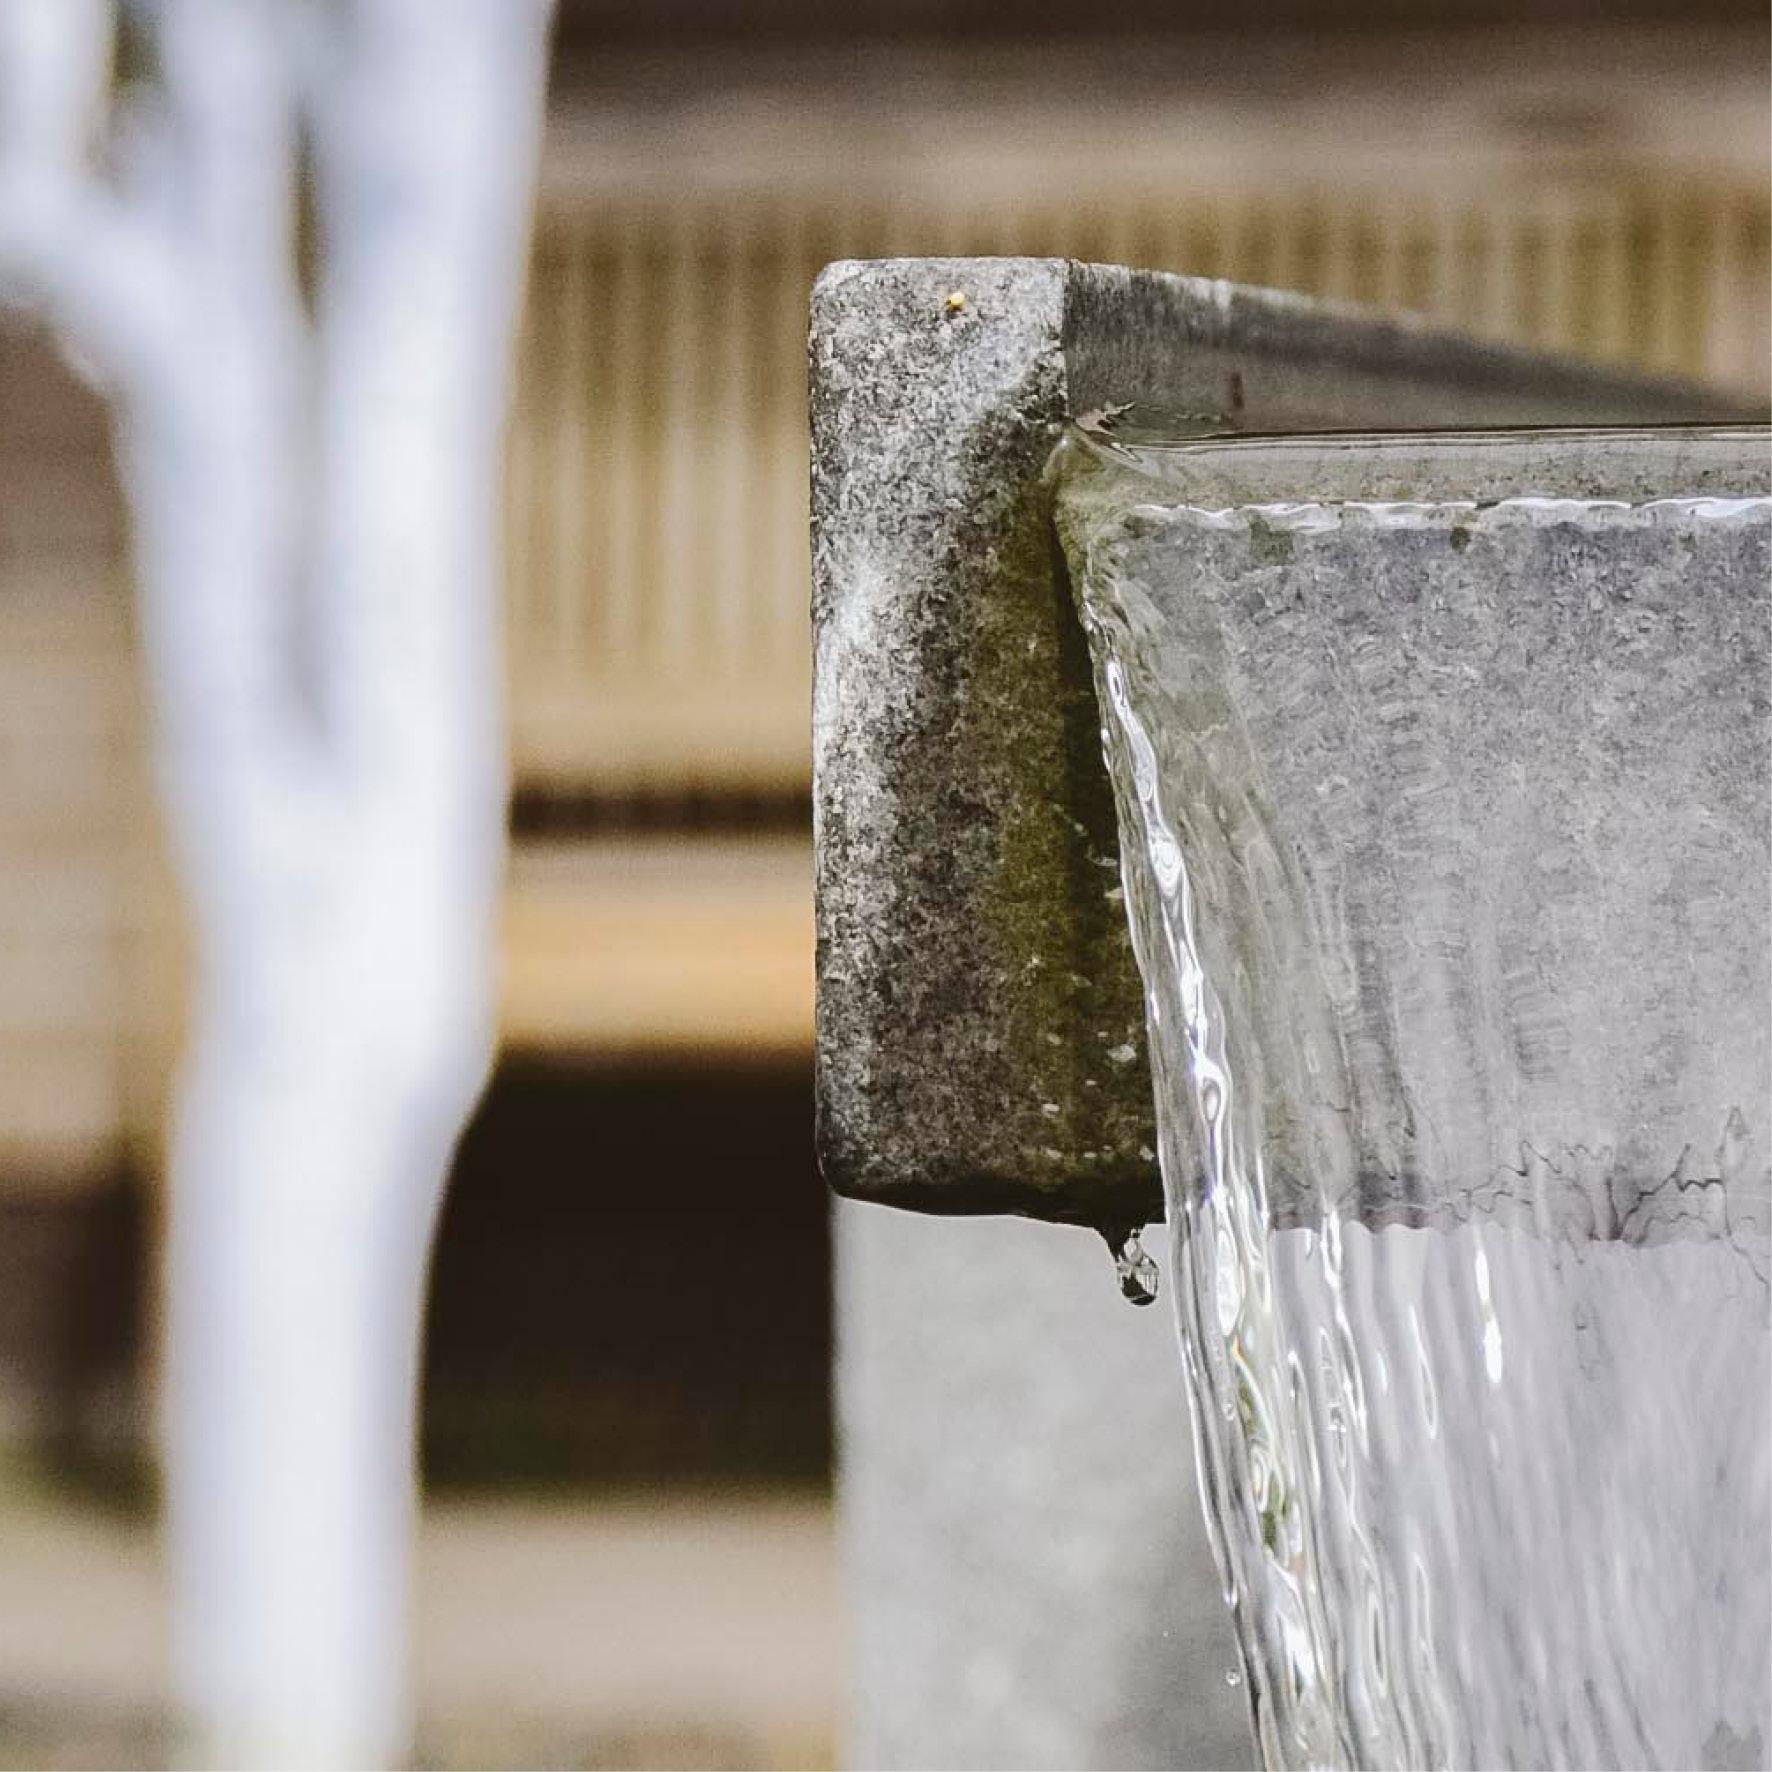 The Lung Project_waterelement_water in de tuin_waterpartij.jpg